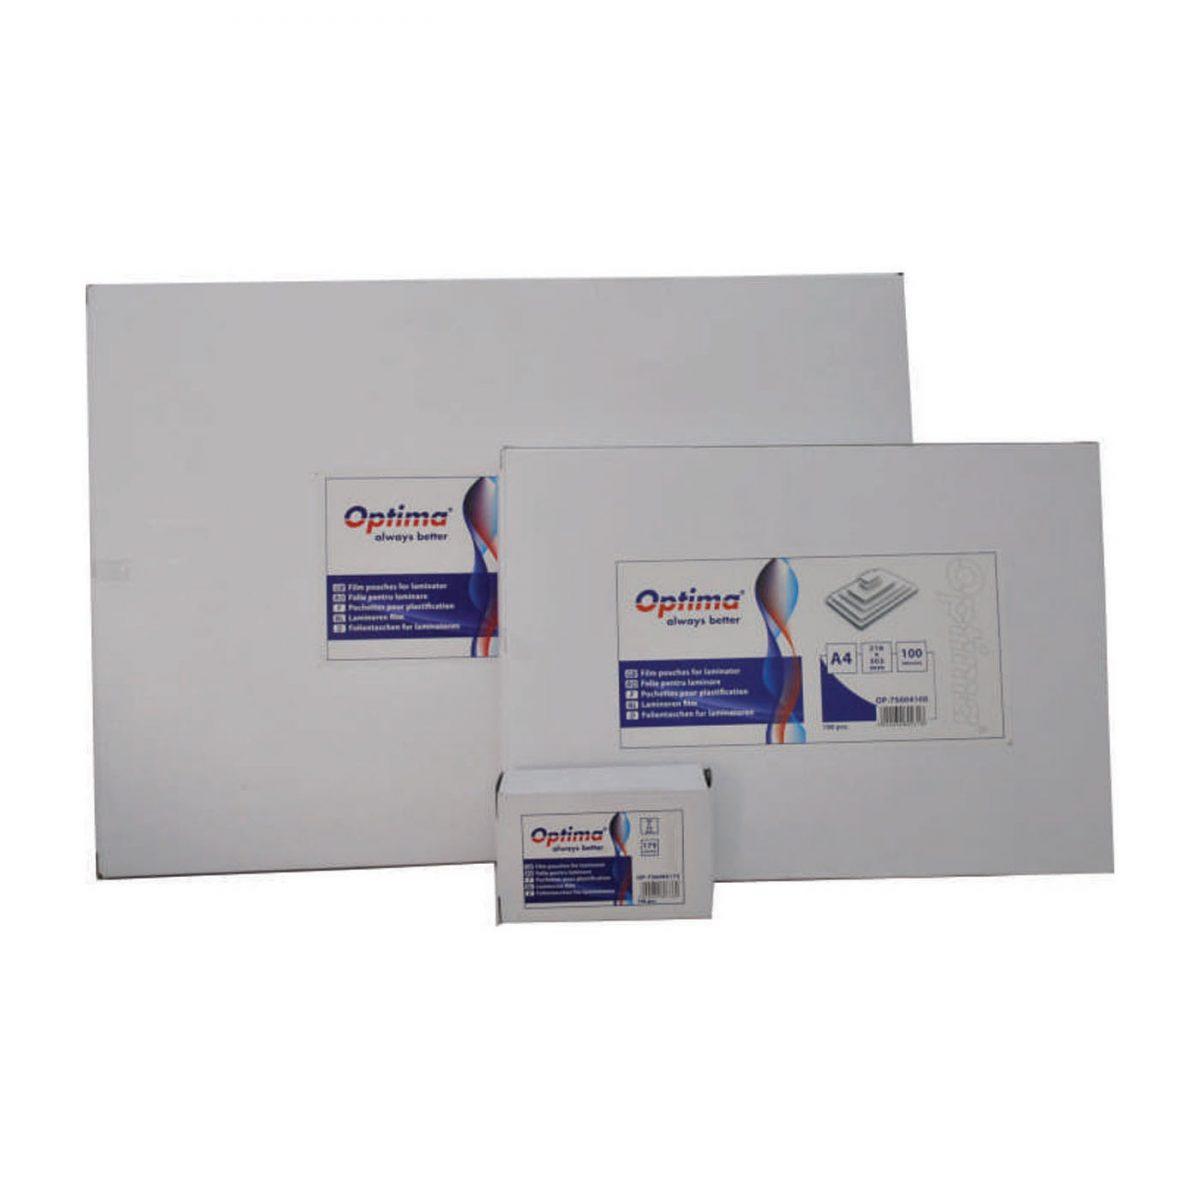 Folie pentru laminare, A4 (216 x 303 mm), 175 microni 100buc/top Optima